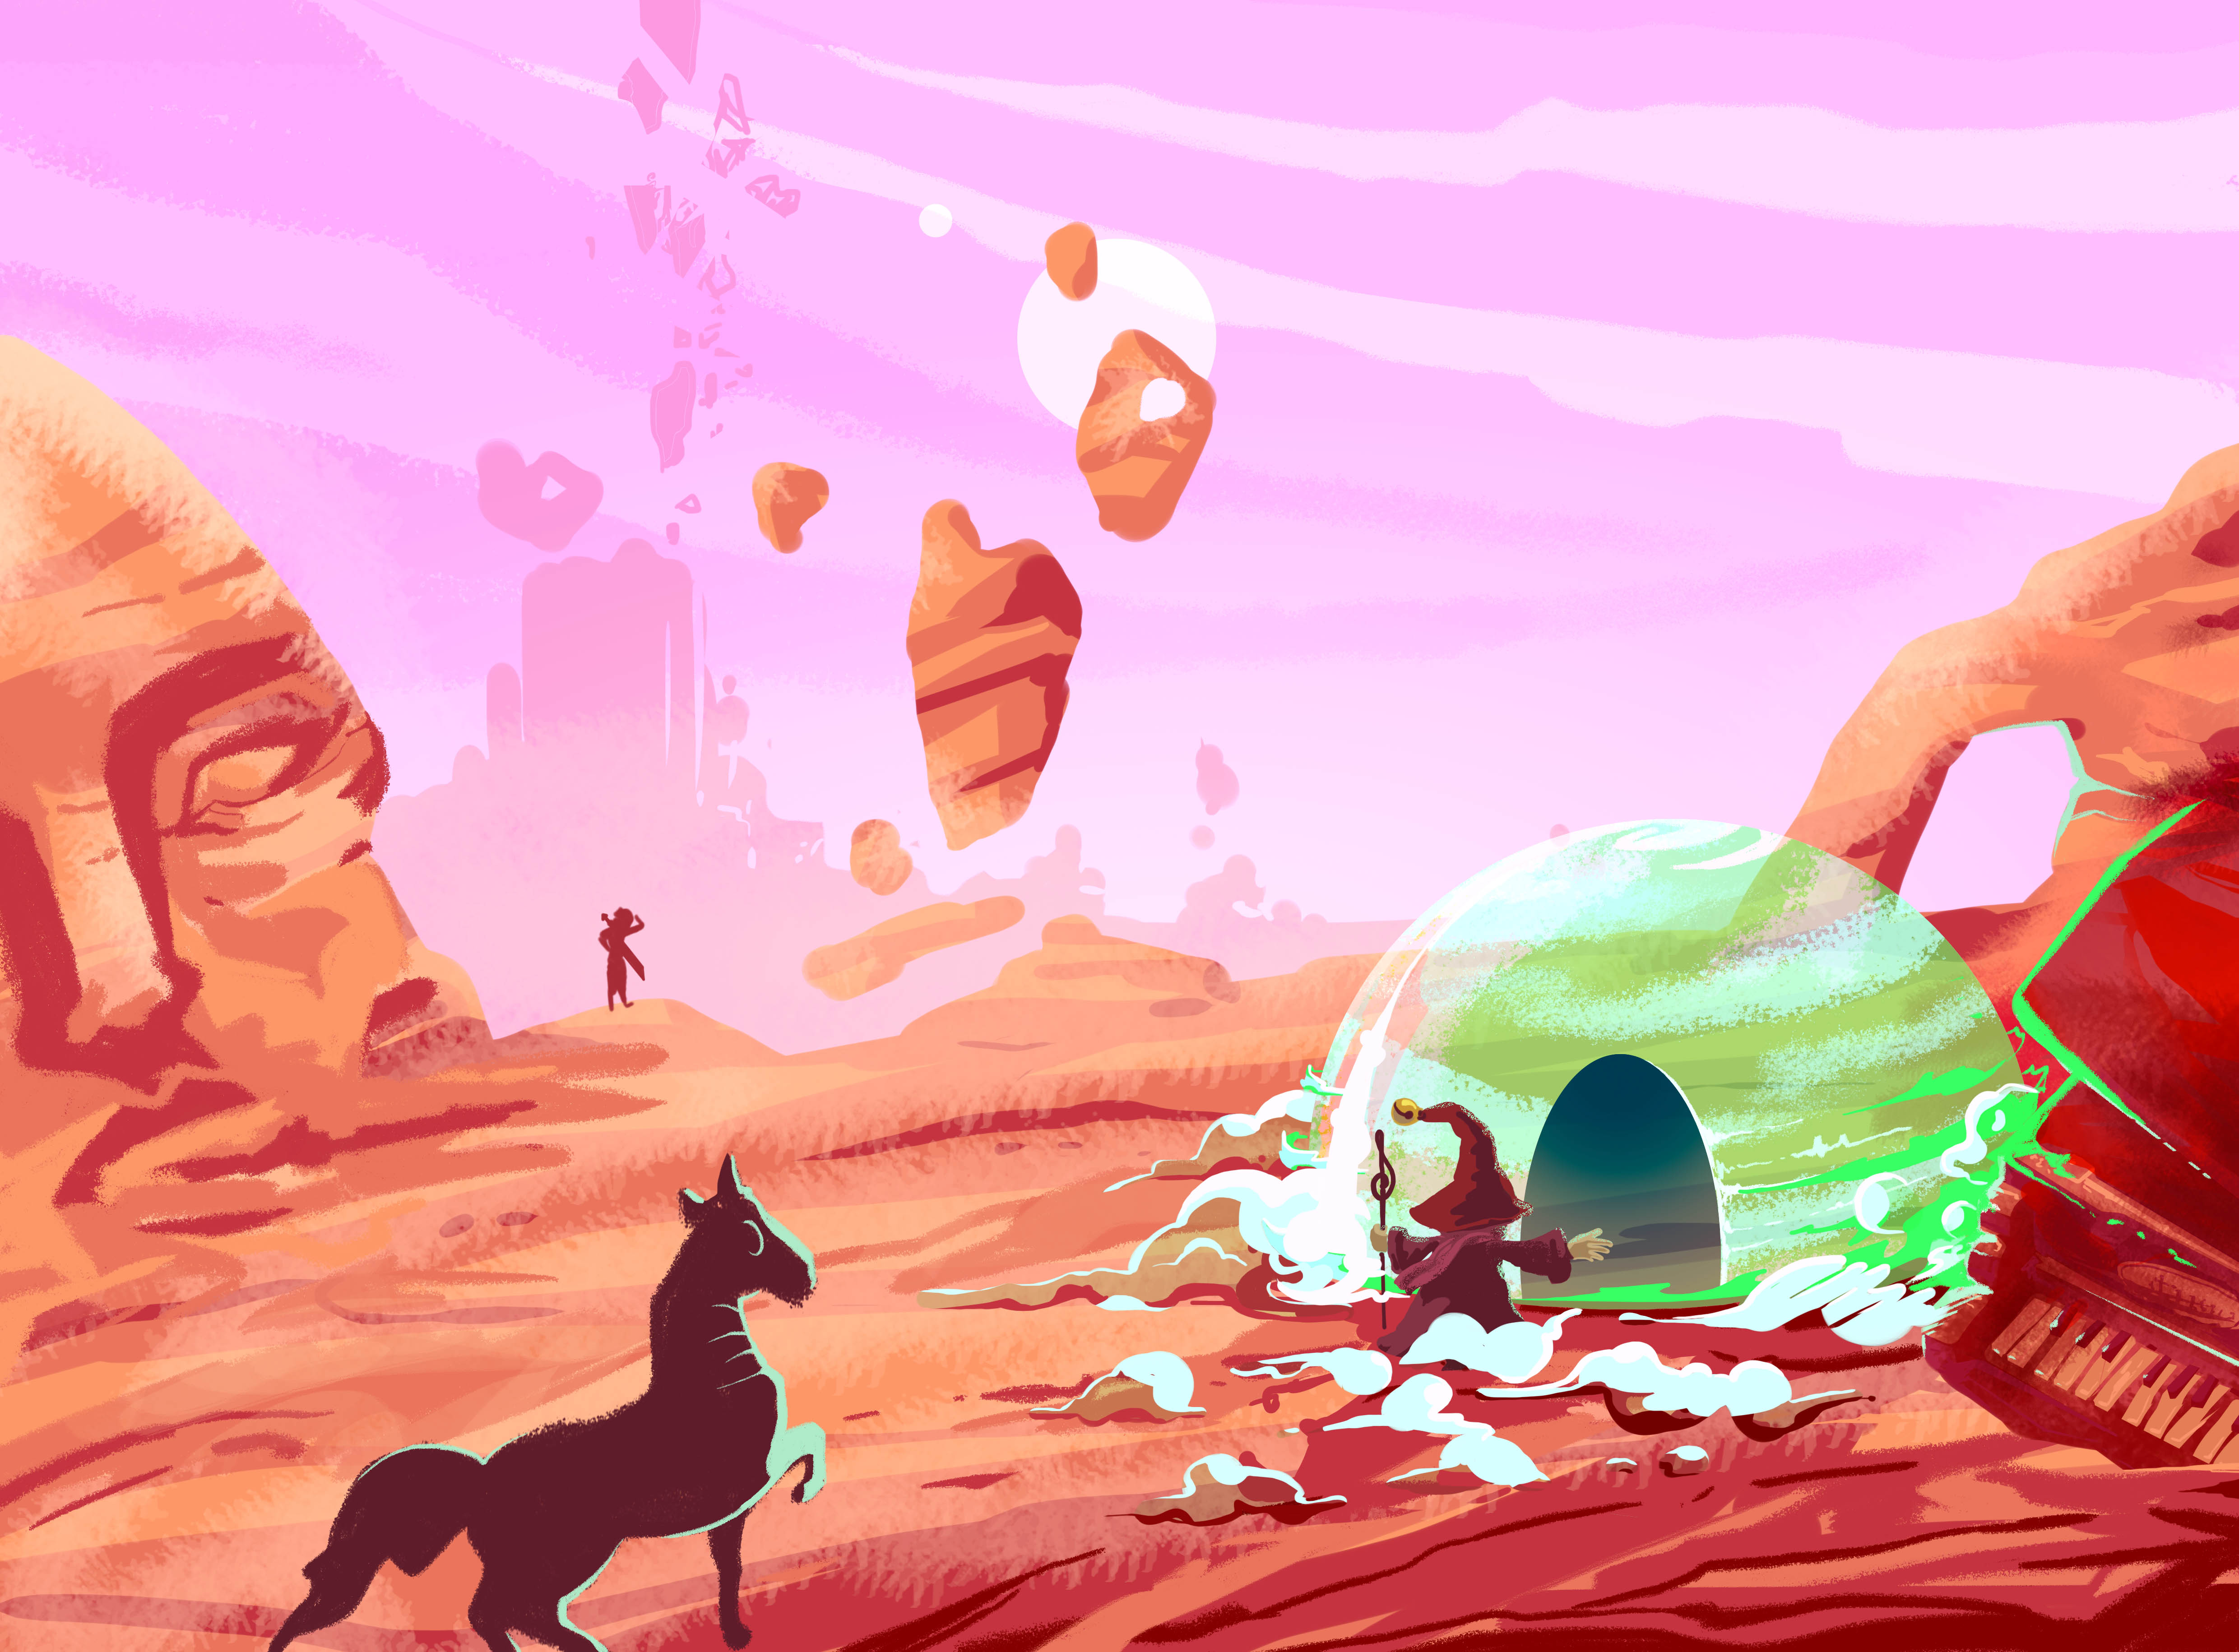 abys-illustration da-lyon rough fantasy world